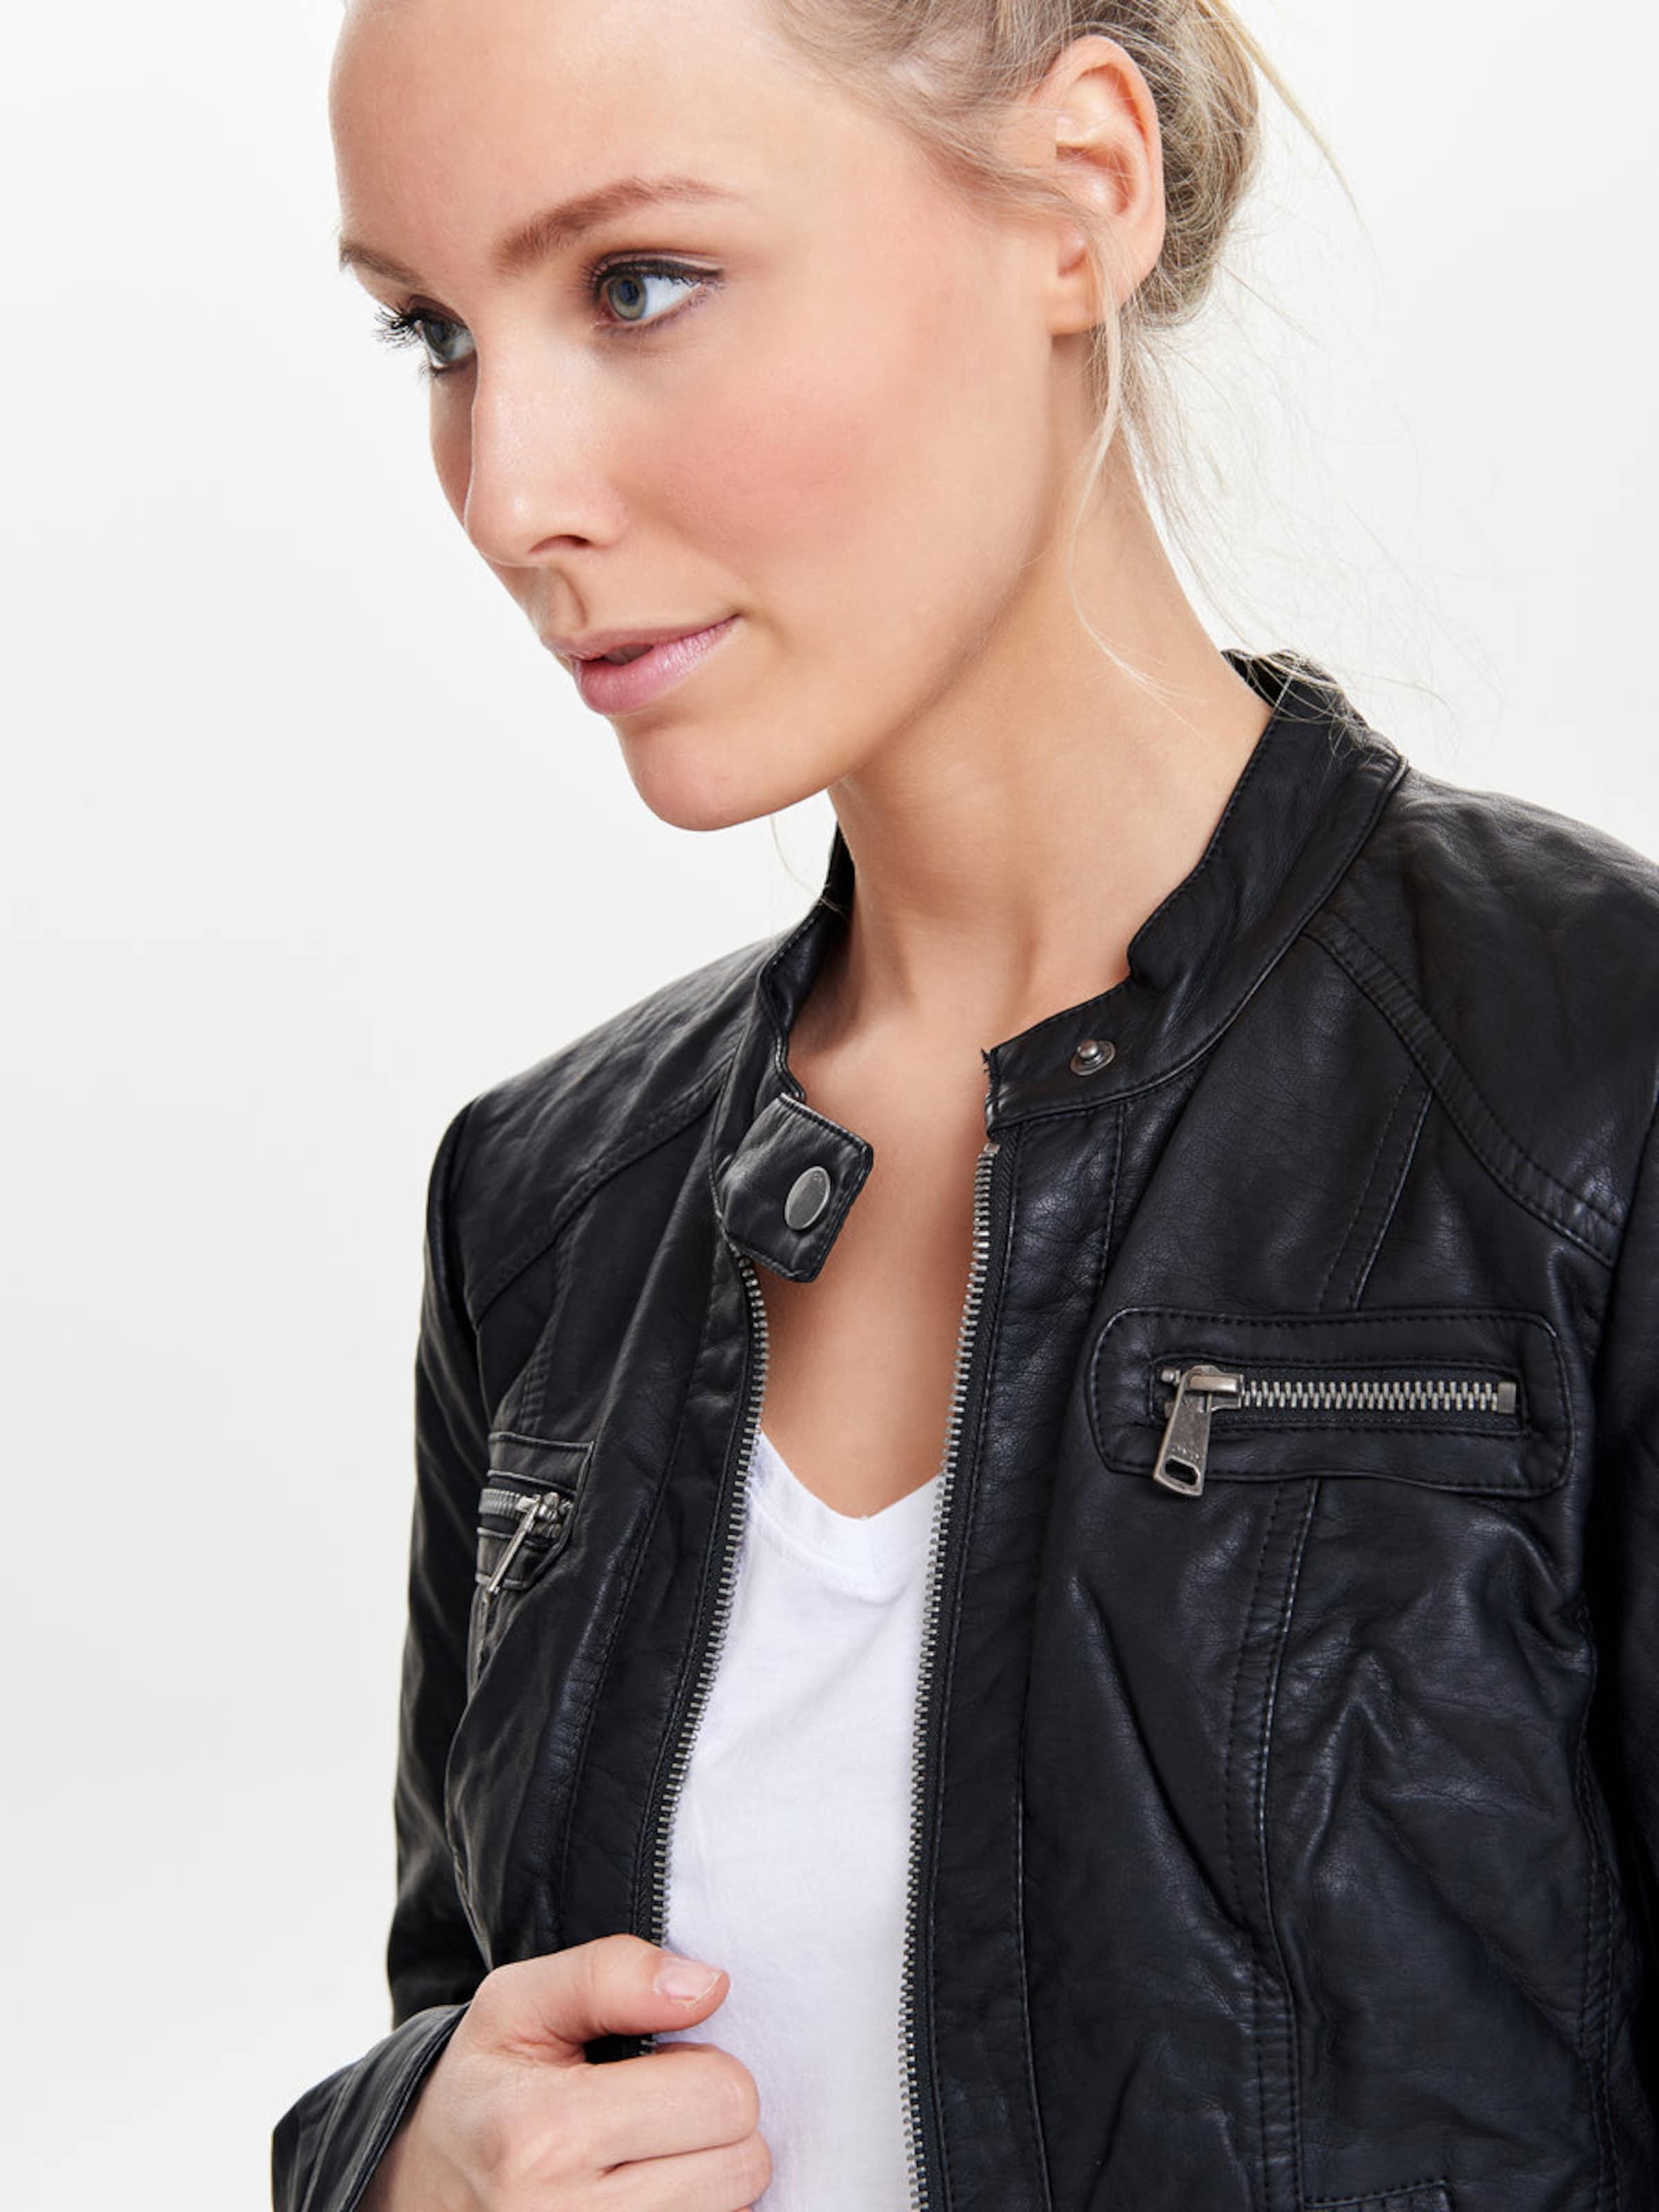 Klassische Online Rote Vorbestellung Eastbay ONLY Jacke in Leder-Optik 'Bandit' gMmLO46TTh